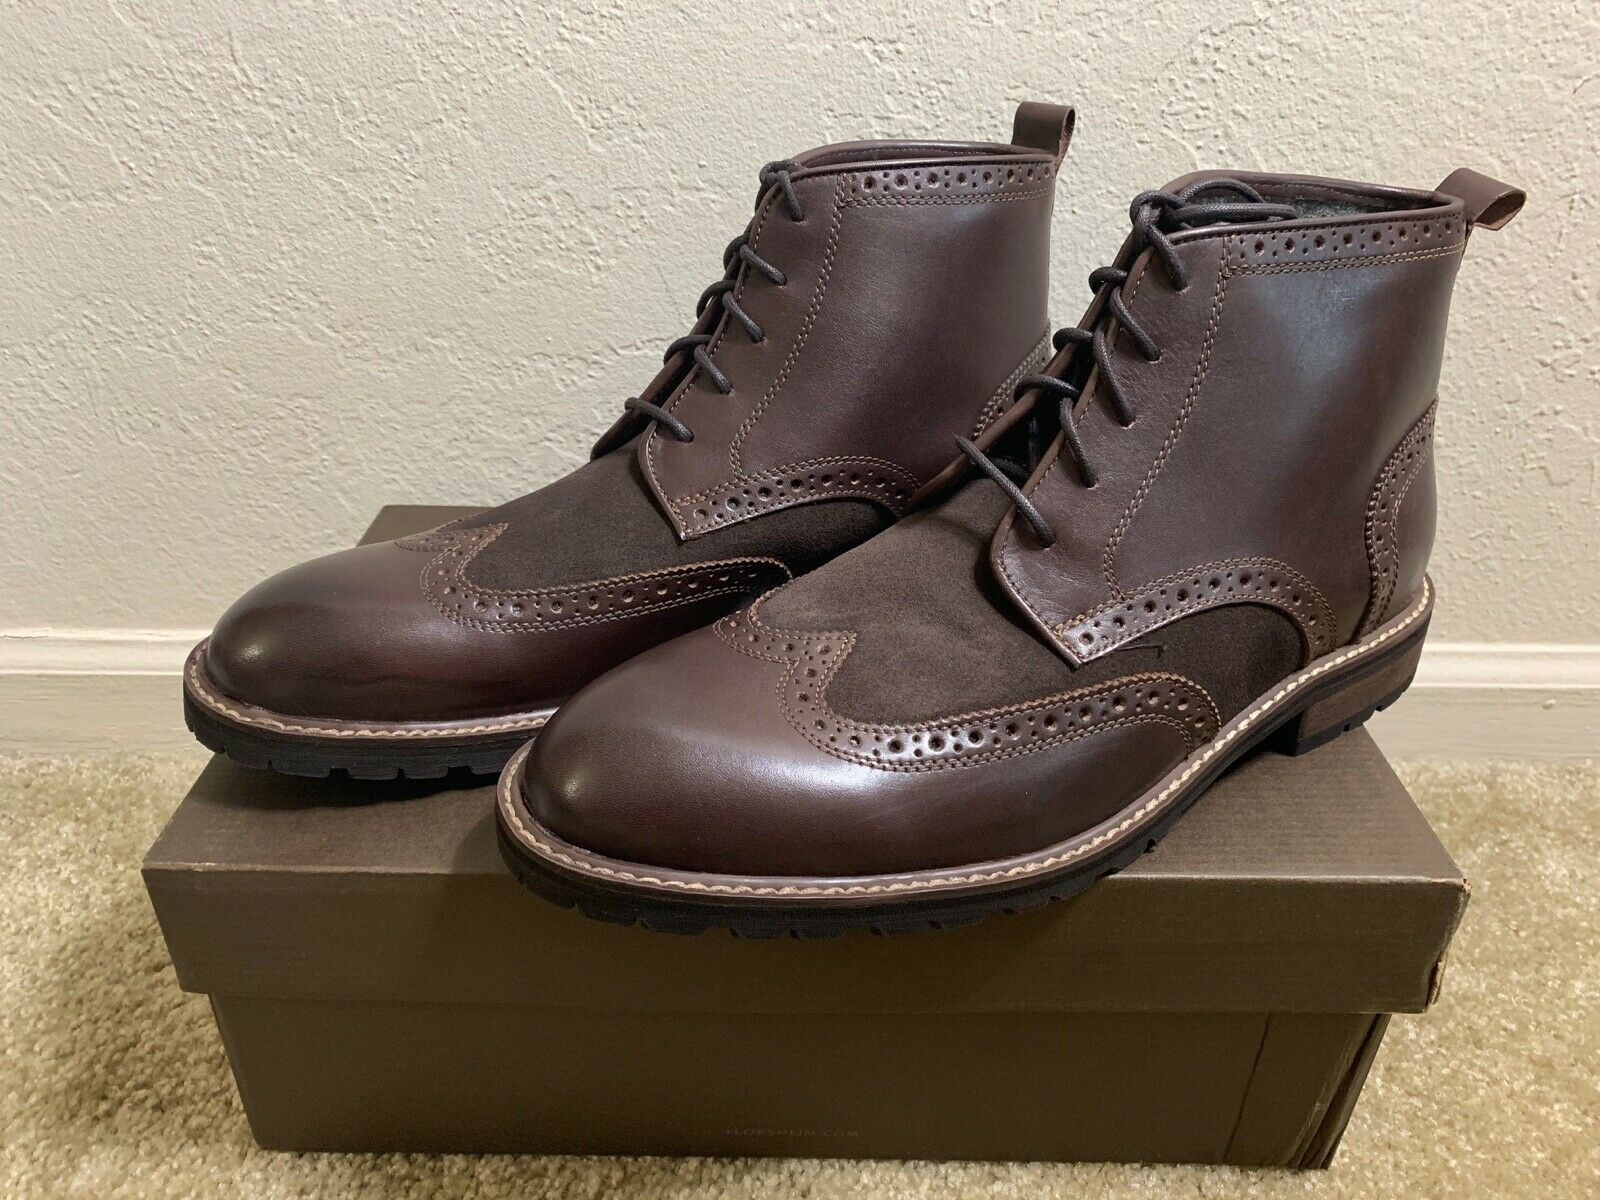 Brand New Florsheim Brannon Wingtip Leather Boot (SIZE 11M)